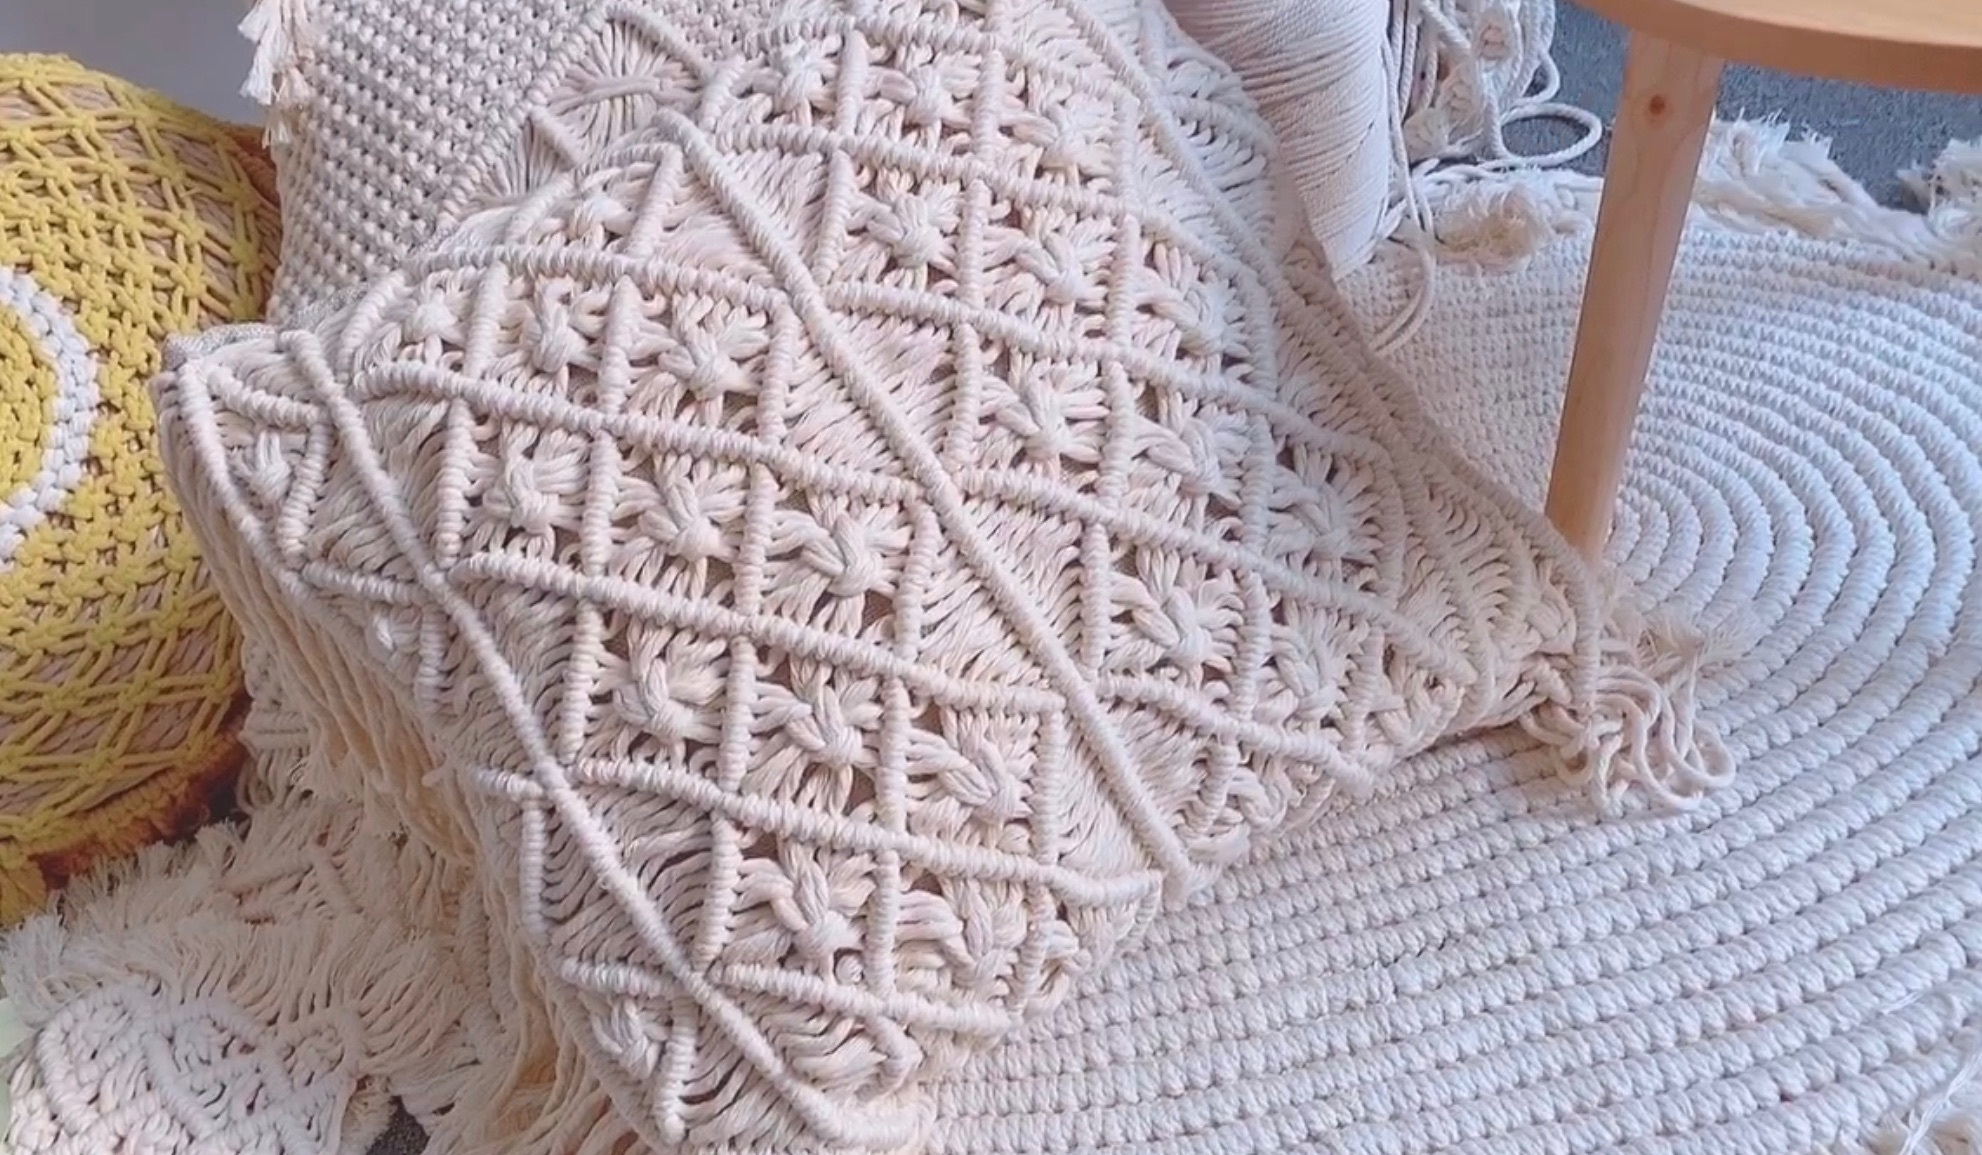 Macrame编织/抱枕